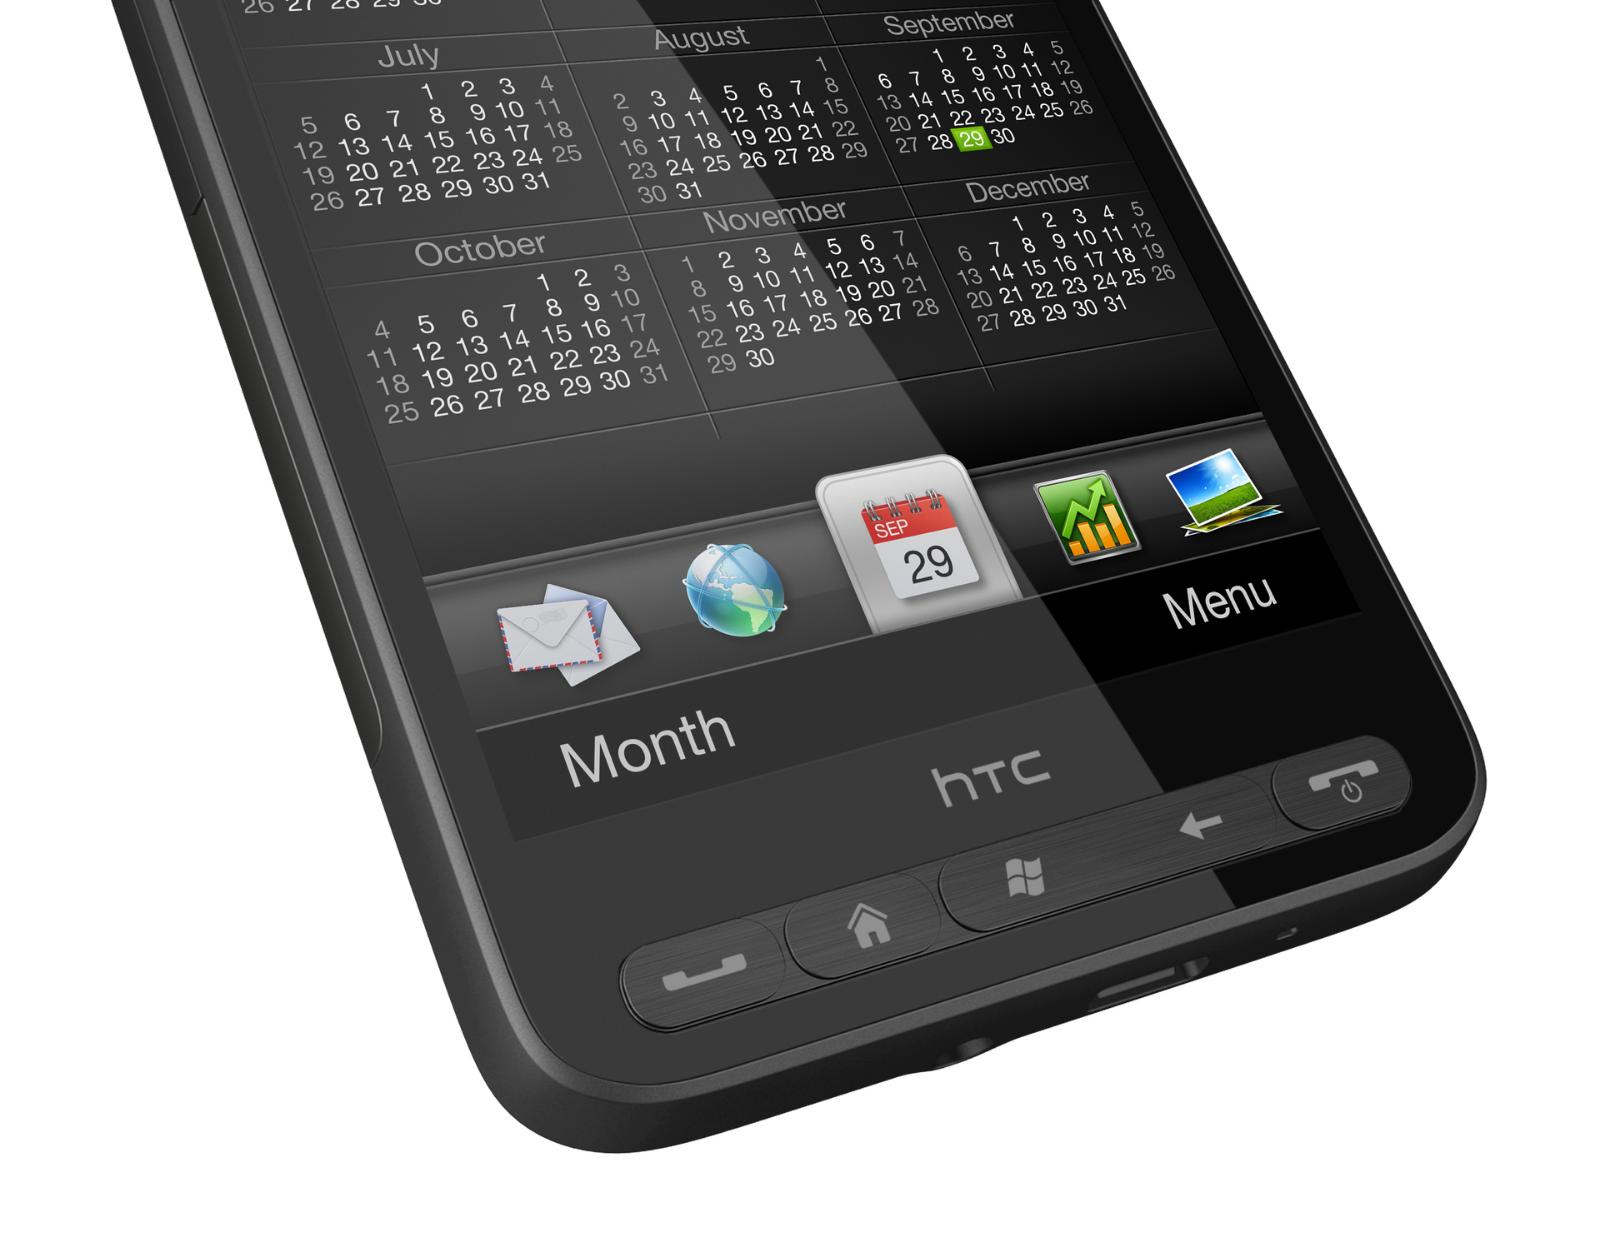 HTC HD2 Leo - Black (Unlocked) GSM 3G WiFi Windows Mobile Touch Smartphone 4